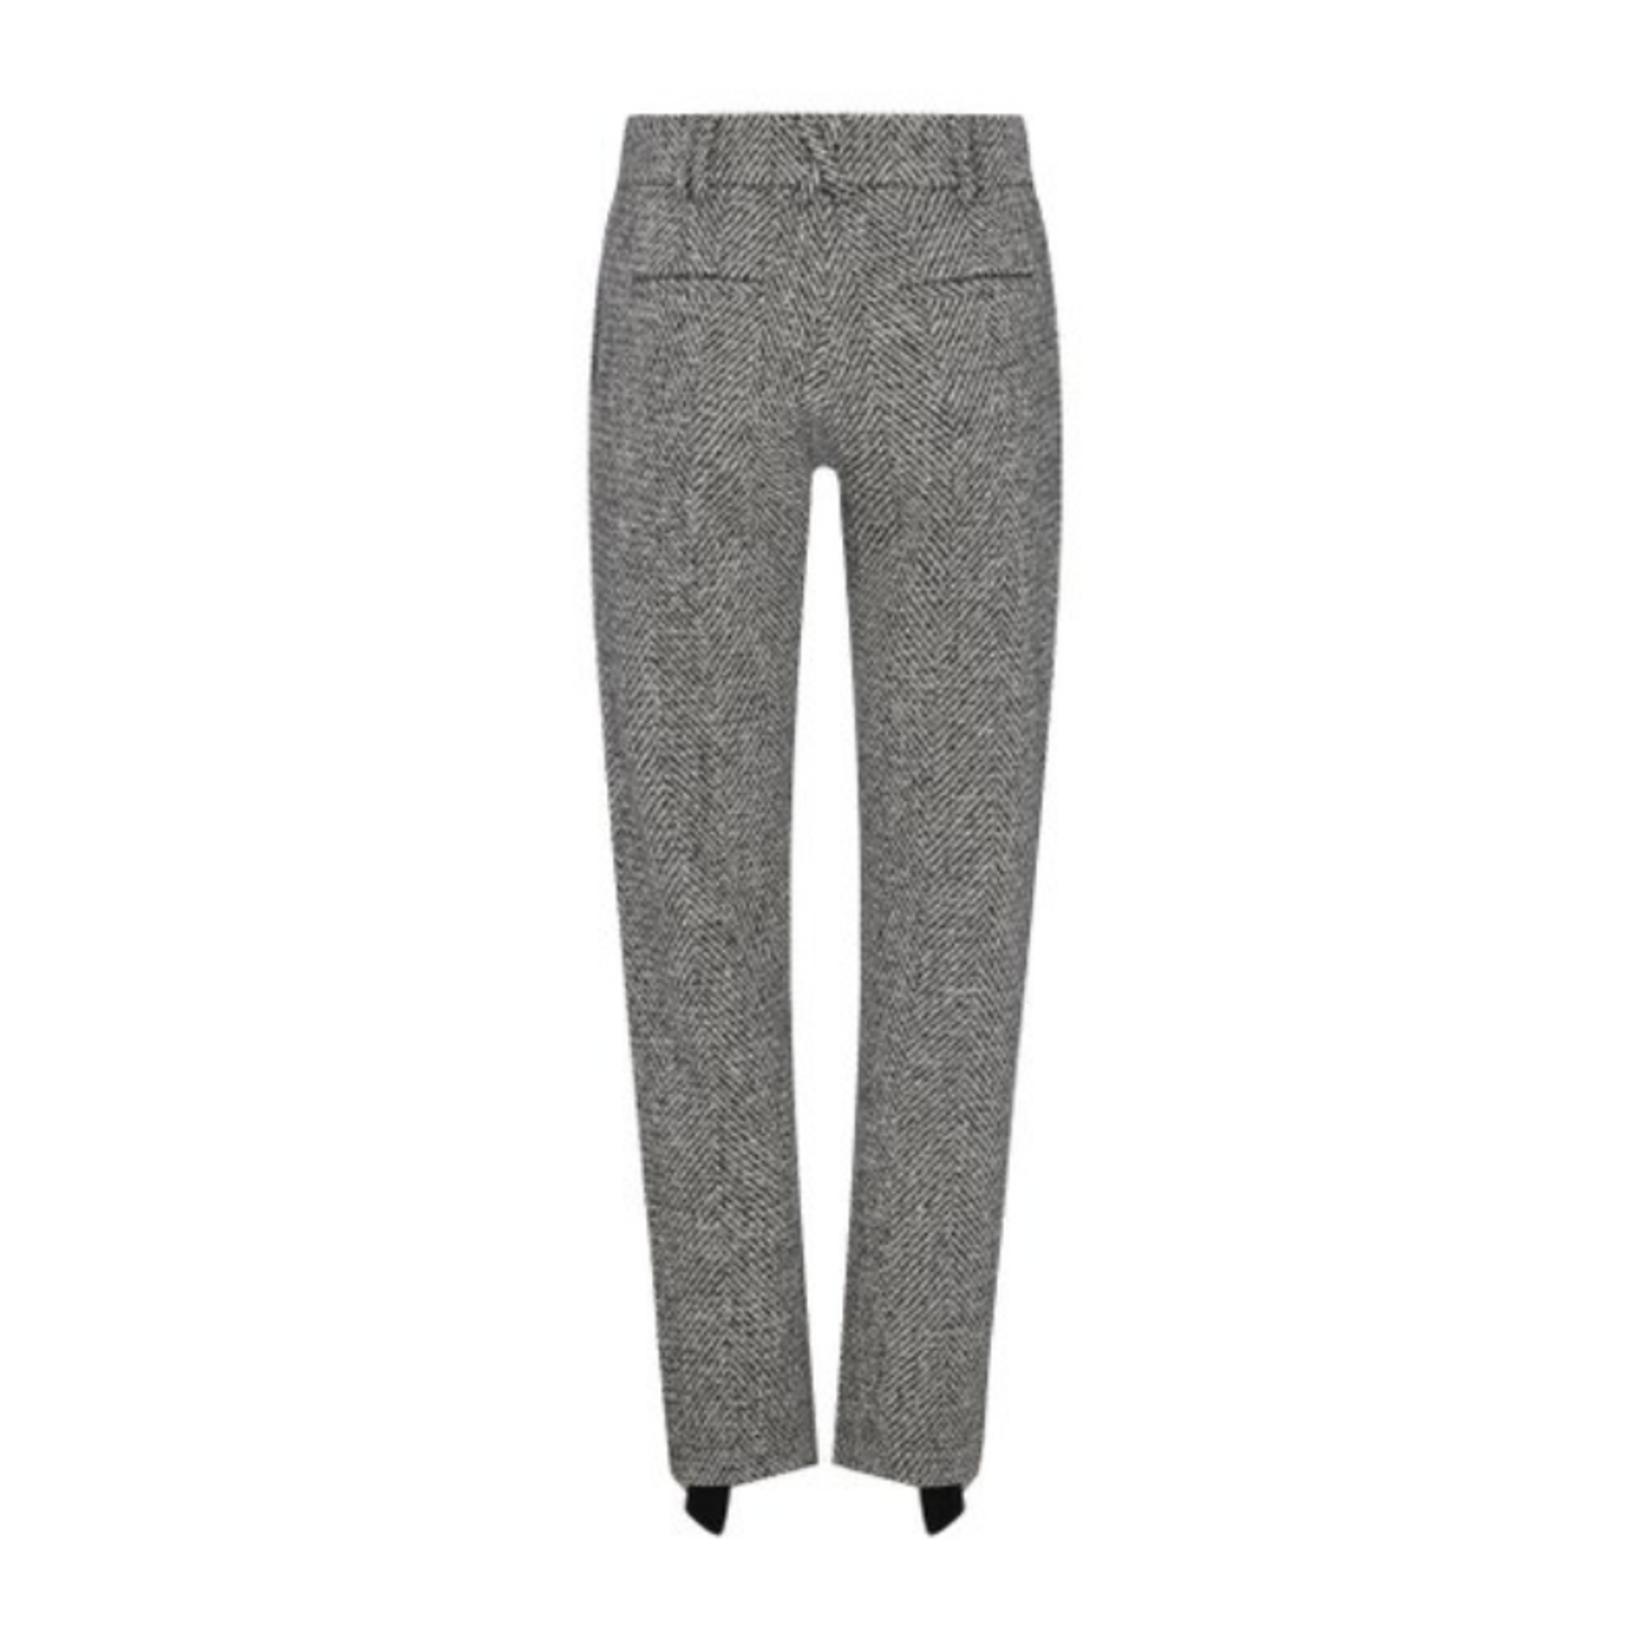 Aje Rebellion Tweed Trouser